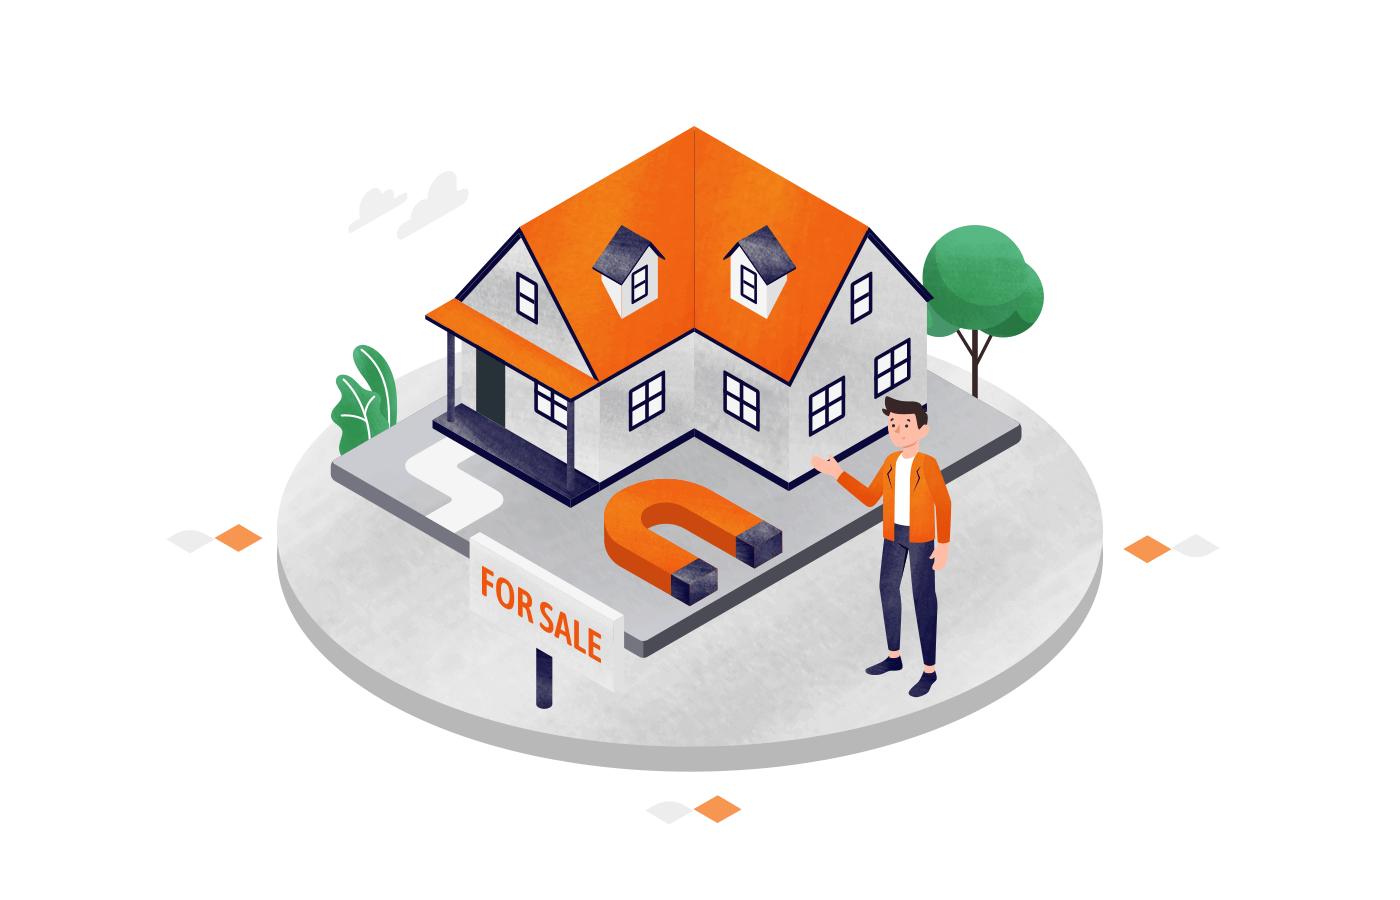 lead_generation_ideas_for_real_estate_illustration